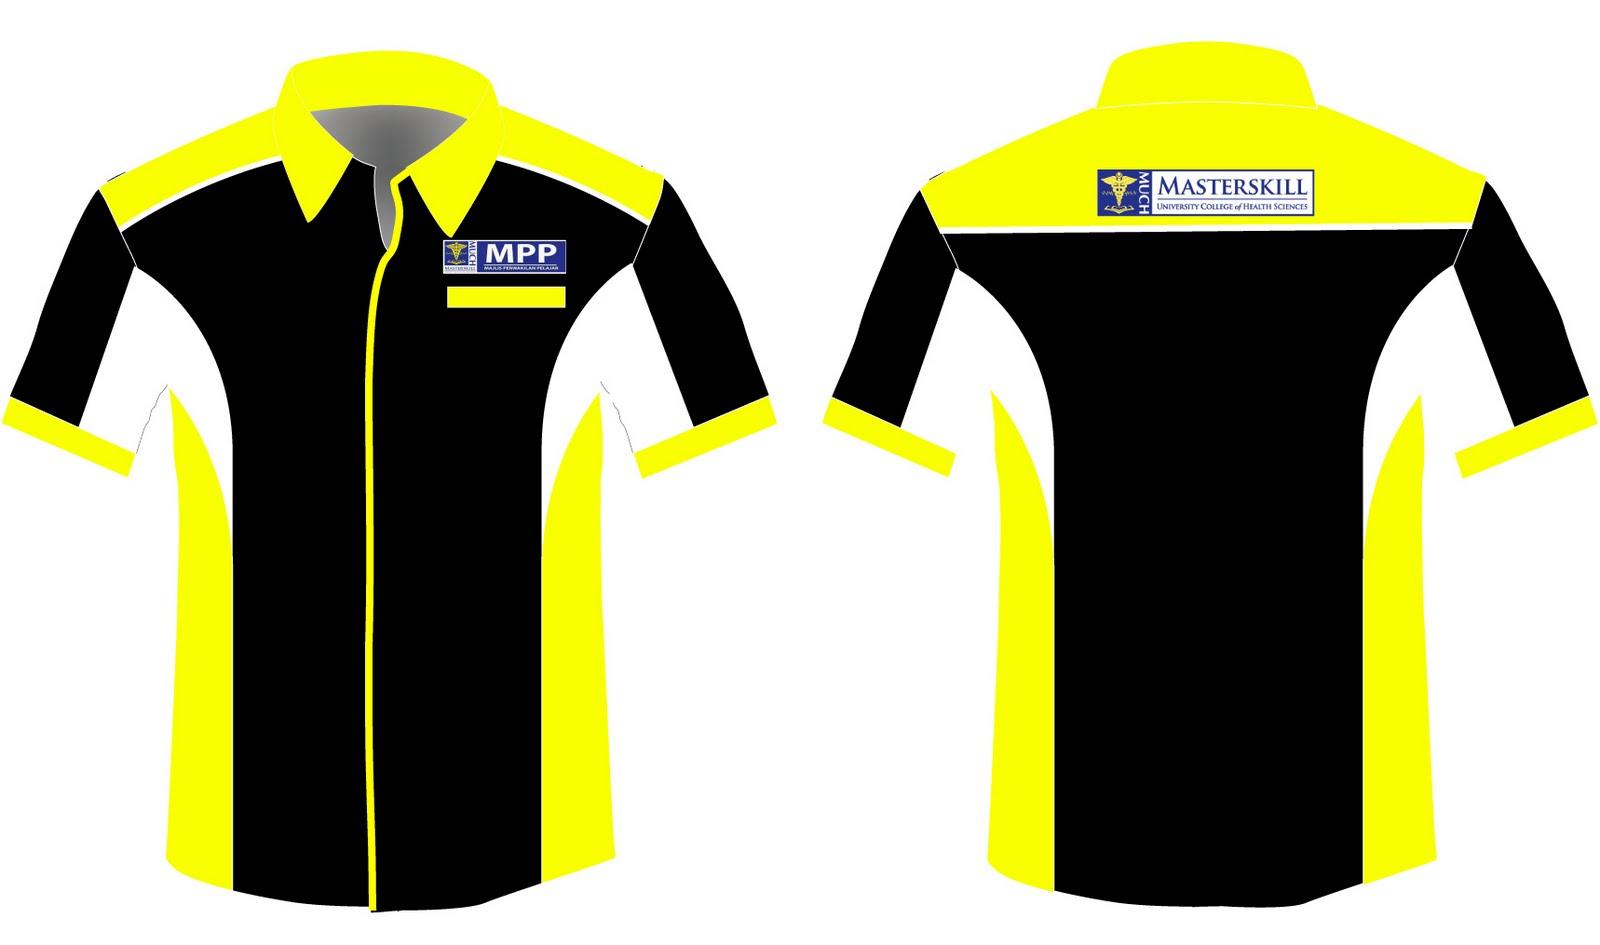 Corporate shirts 2011 oren sport corporate shirts 2011 maxwellsz